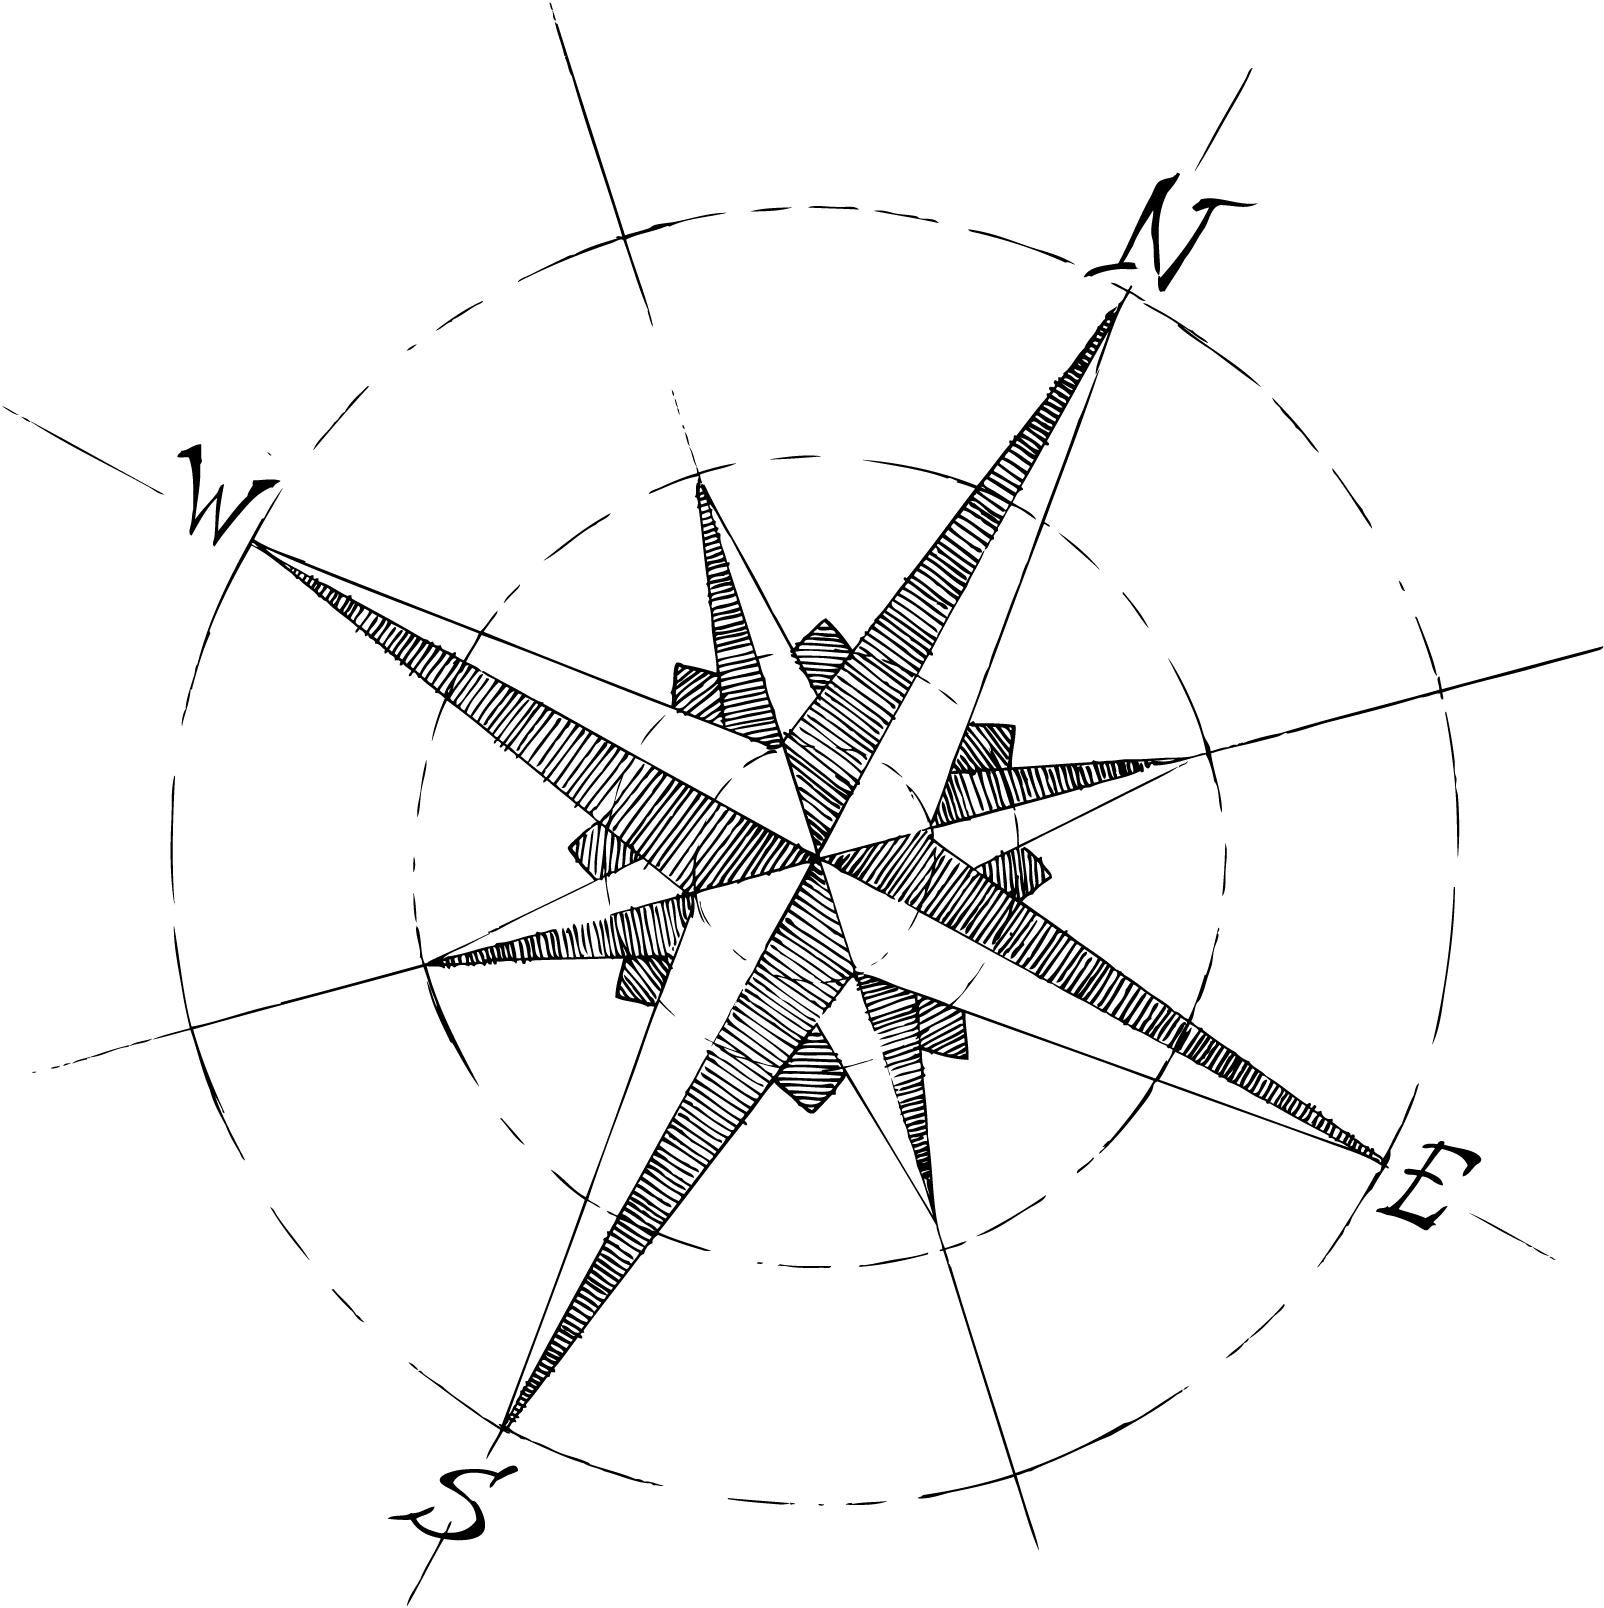 Compass-Rose-2.jpg